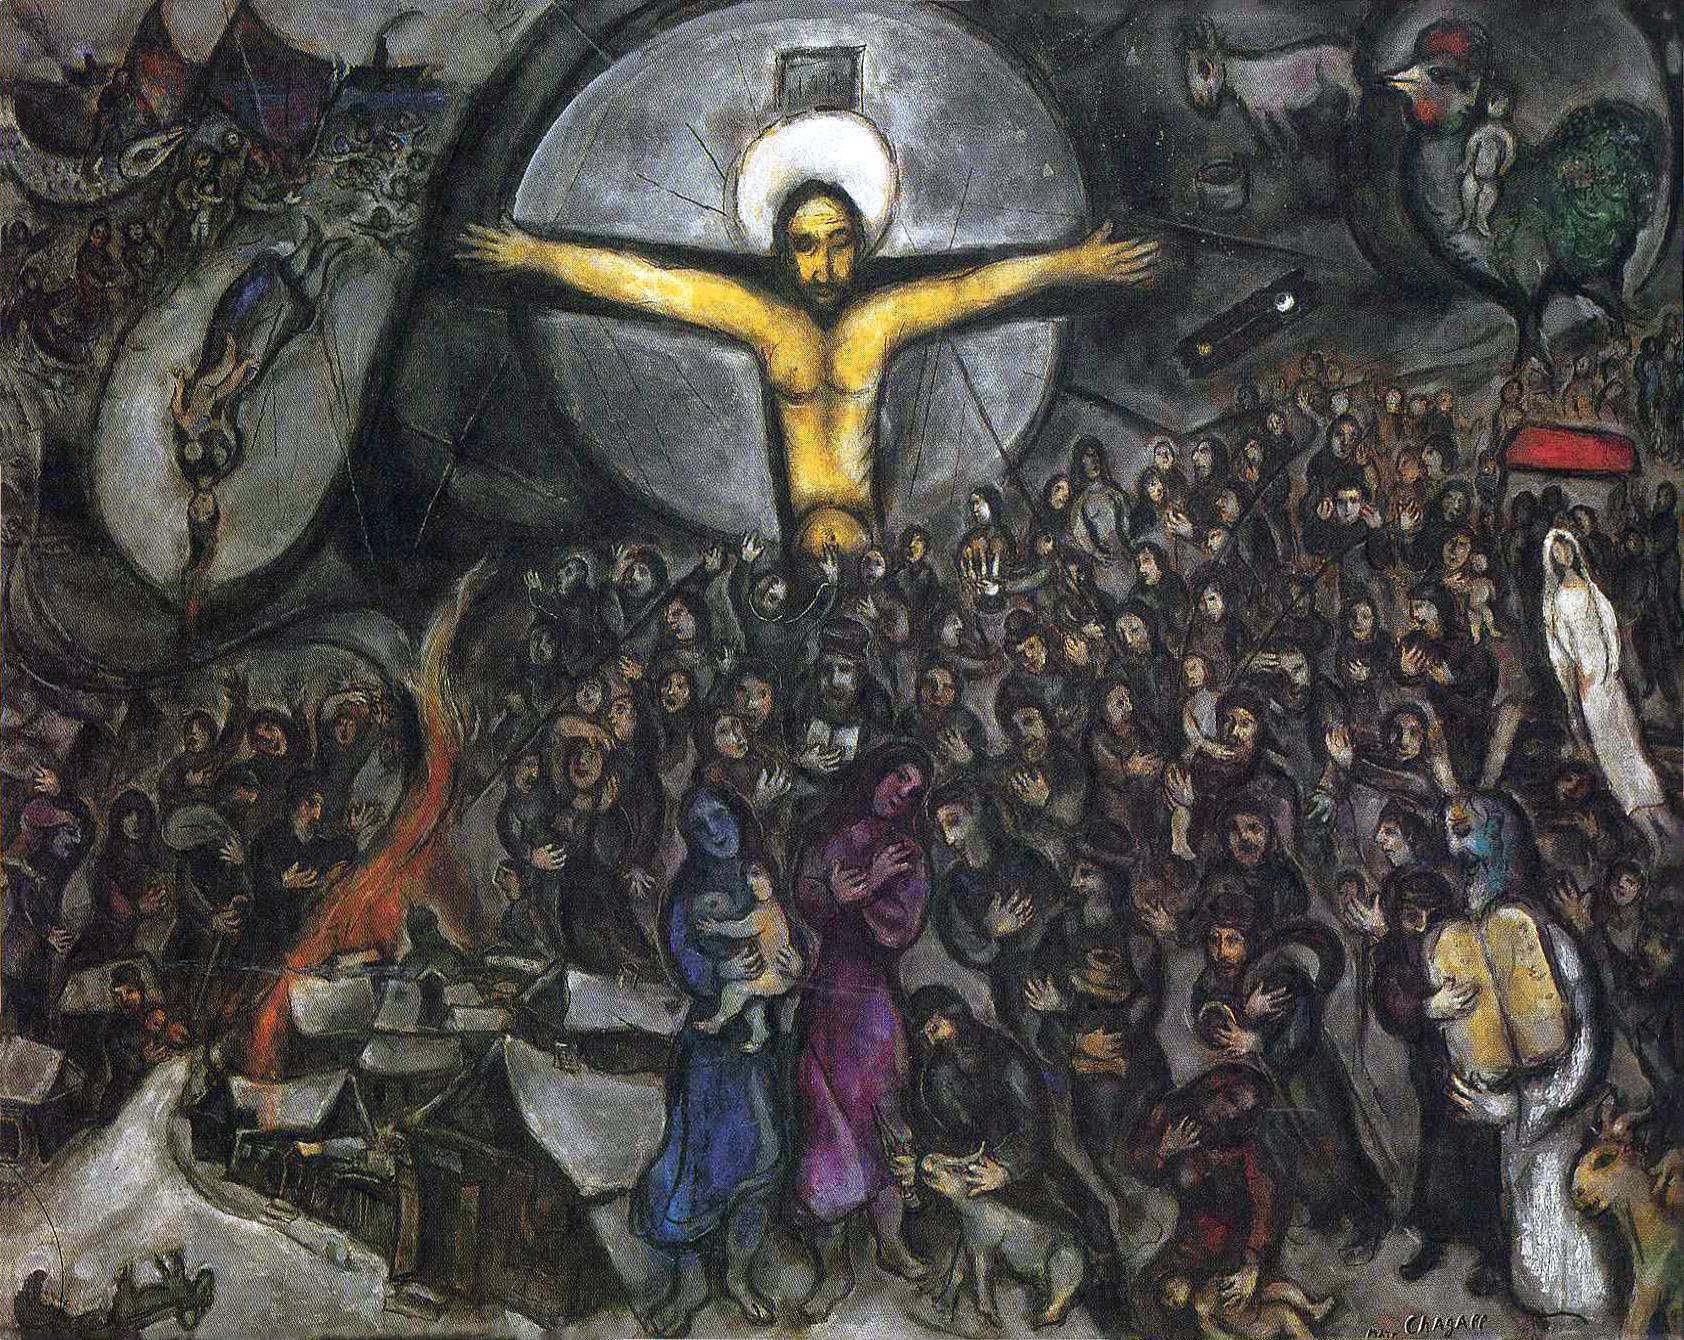 chagall_exodus-1966